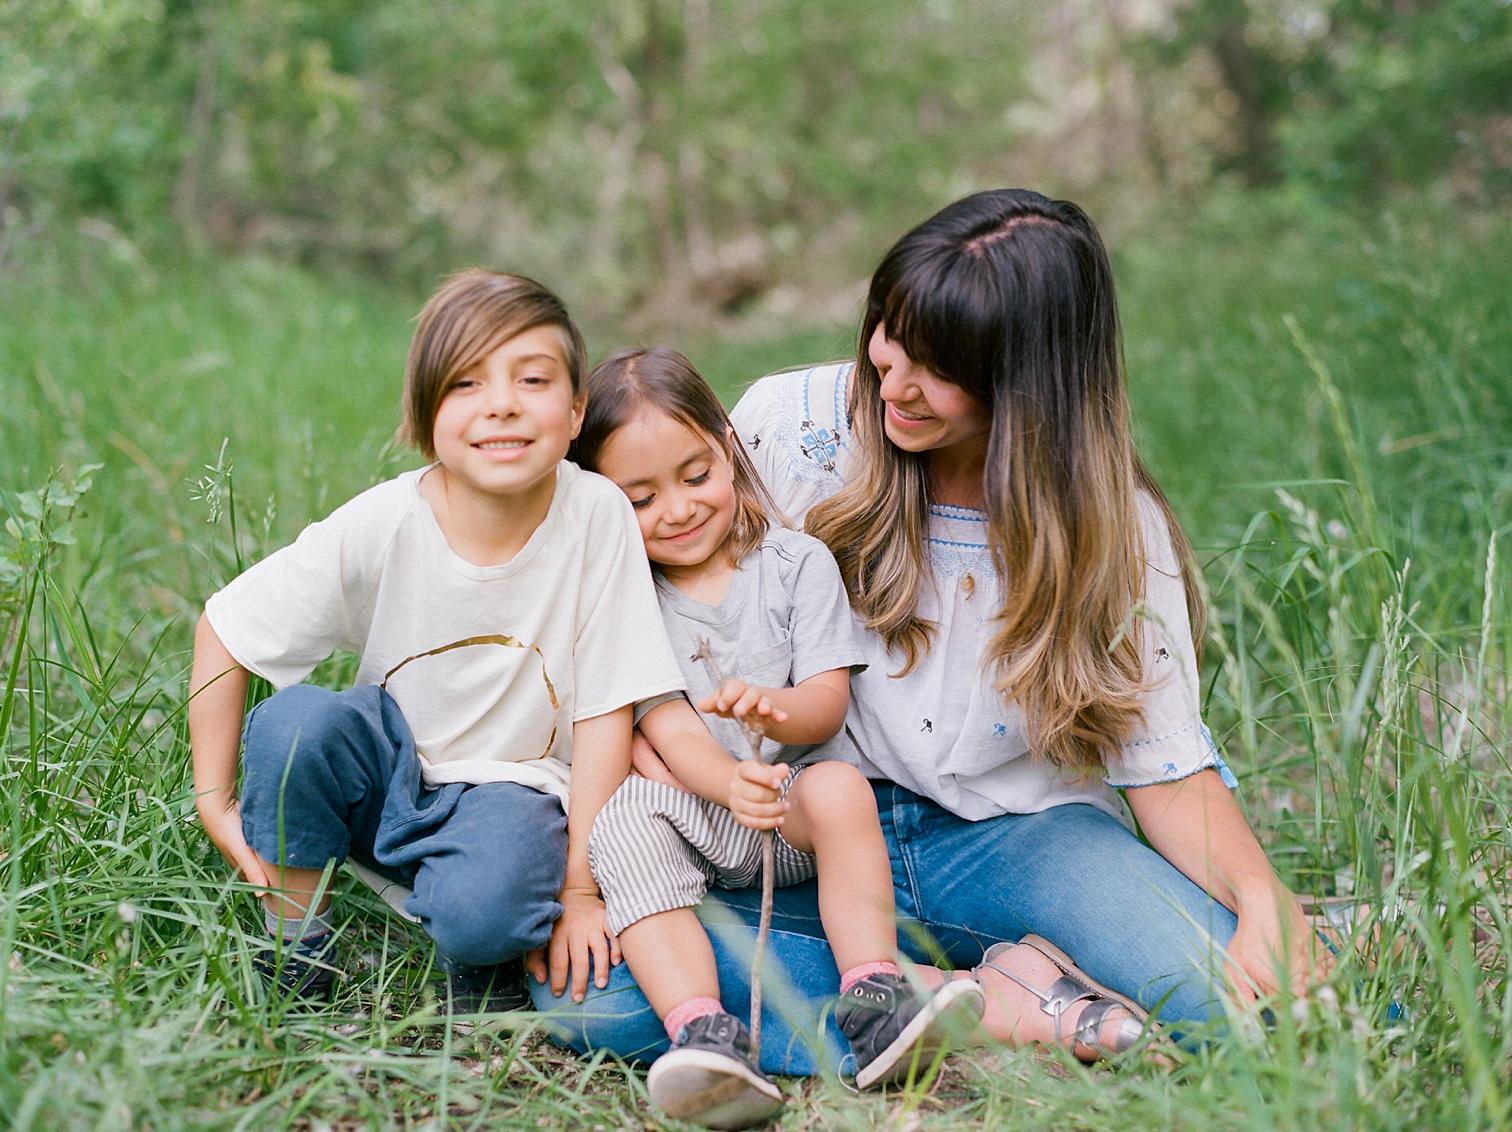 Film Photographers, Colorado Family Portraits, Fort Collins Portrait Photographer, Summer Family Portraits, Mother With Children, Family Portraits With Rolleflex Camera, Danielle DeFiore Photography